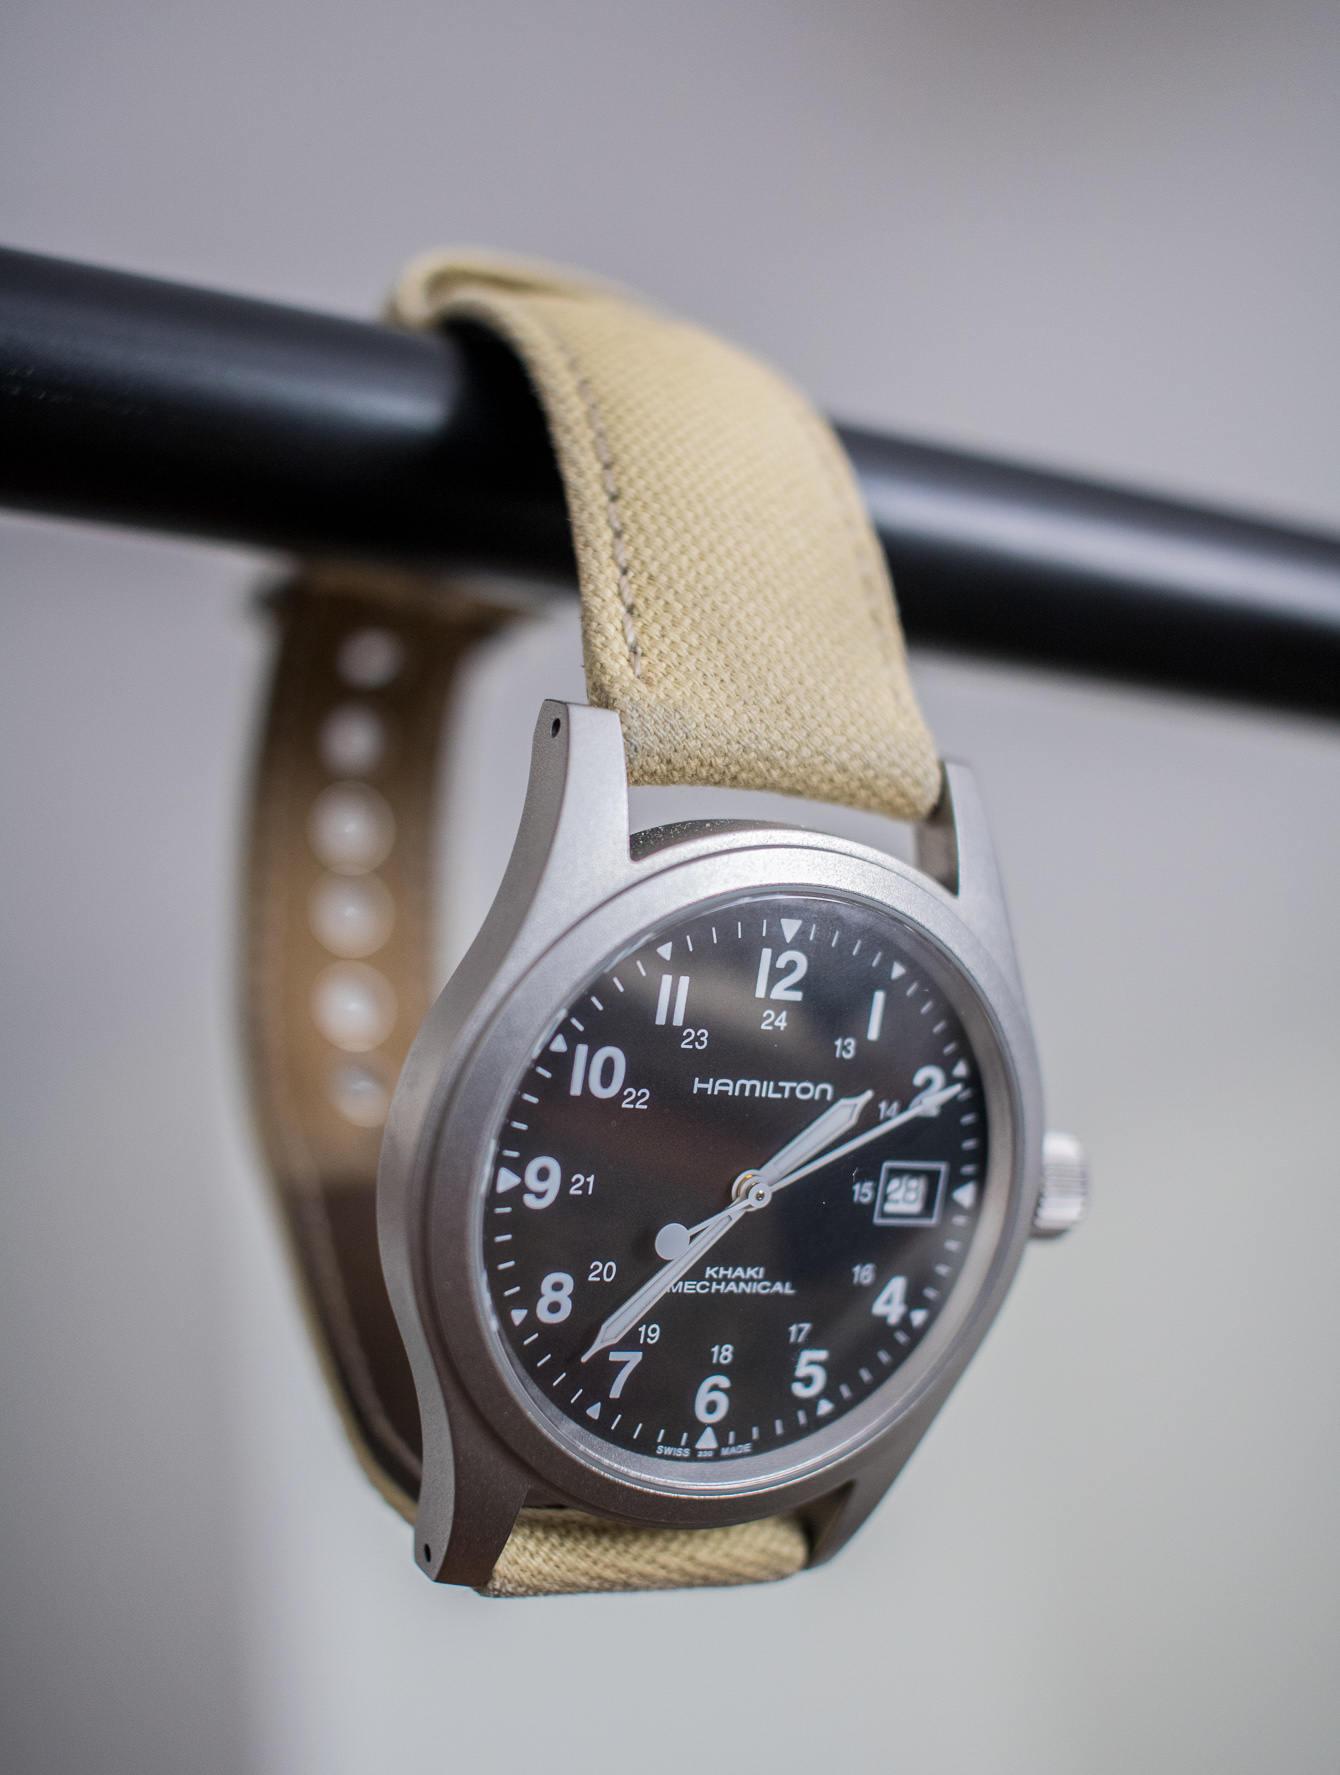 Hamilton Khaki Mechanical watch hanging